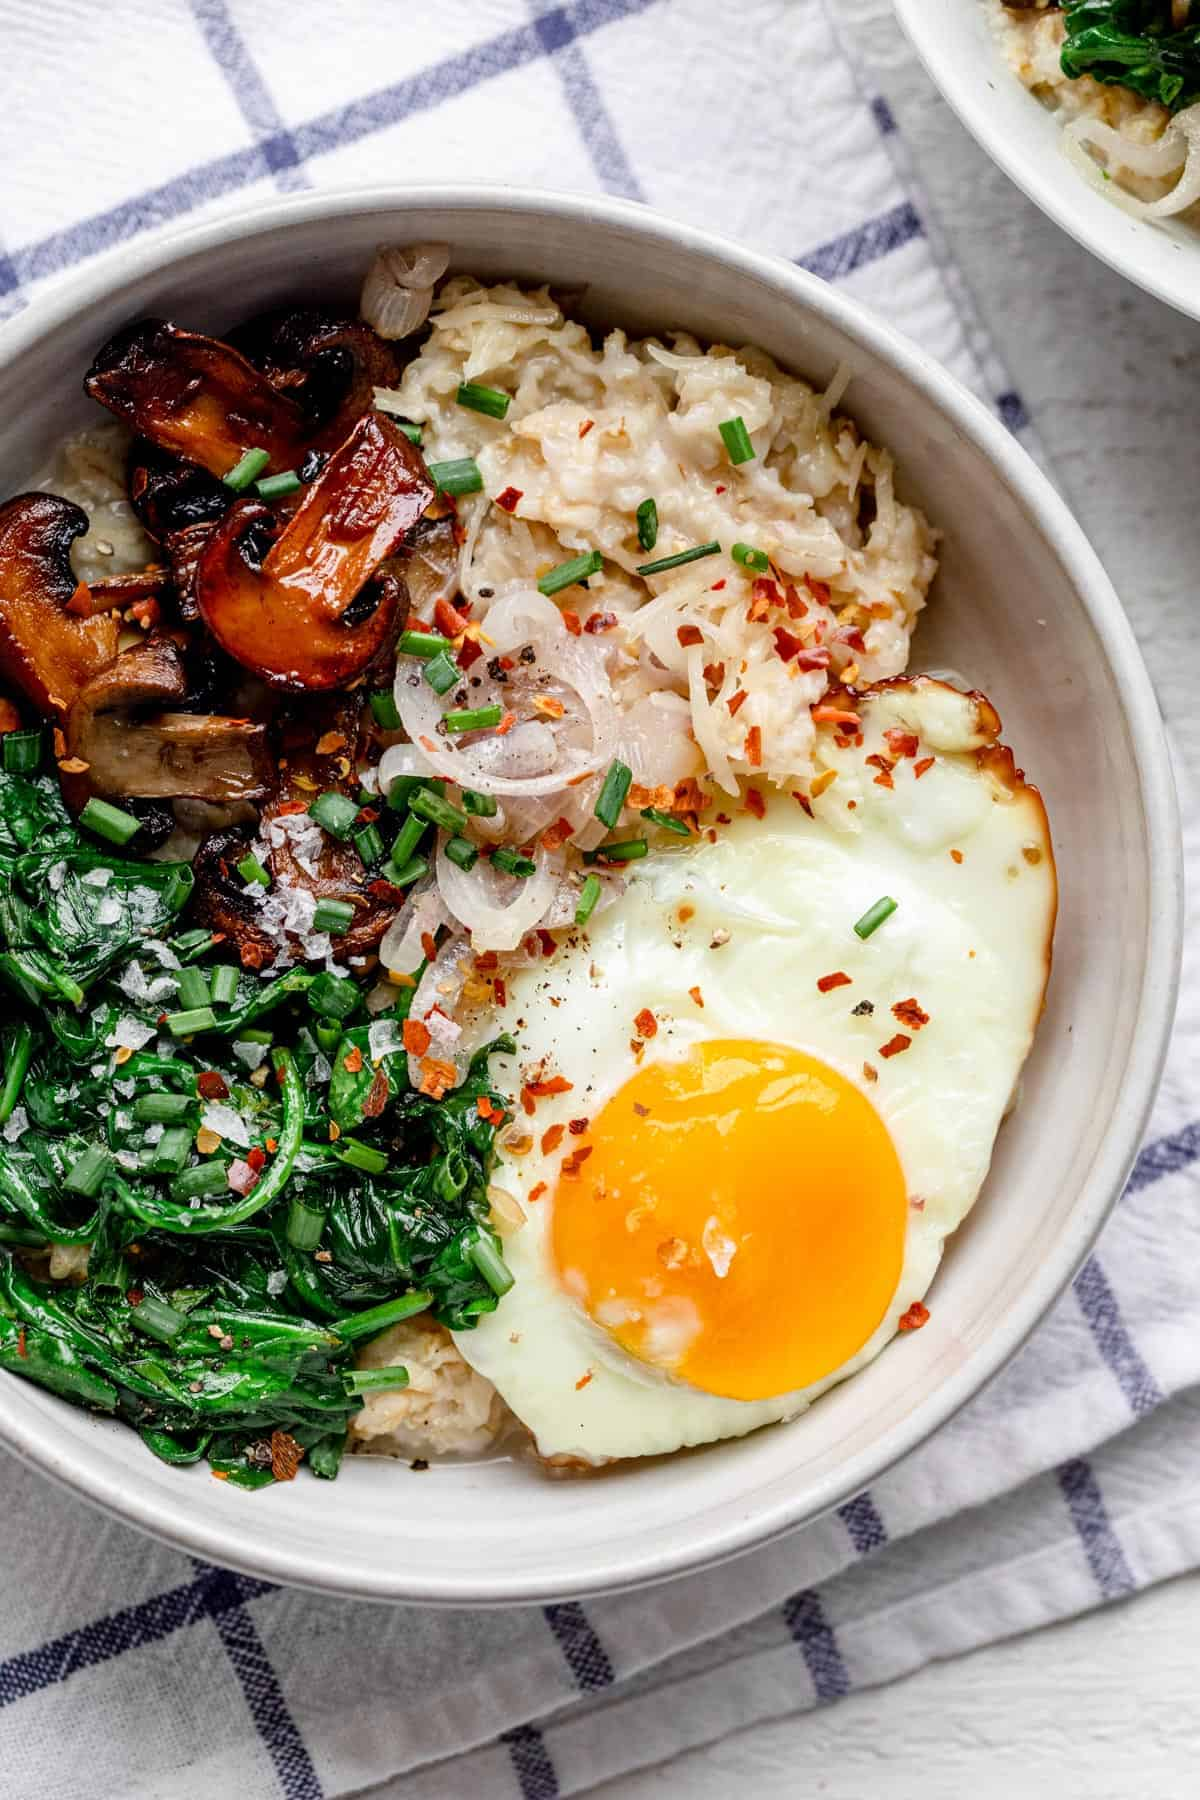 savory oatmeal with egg breakfast